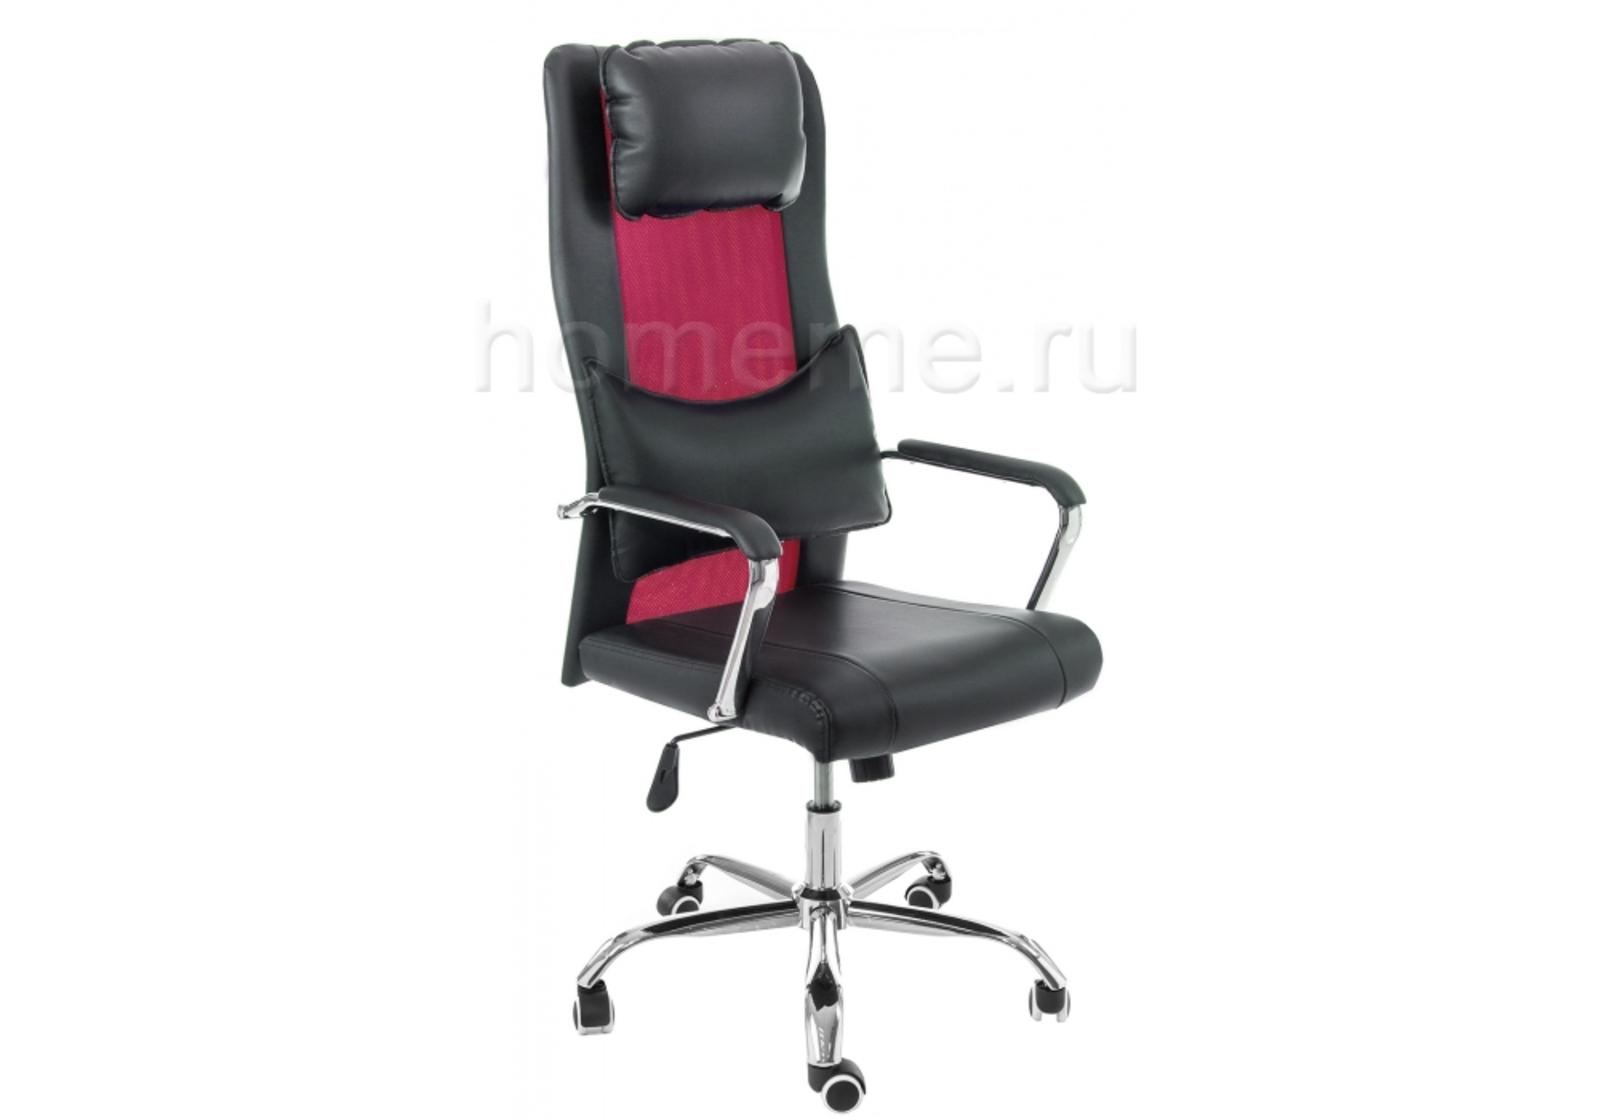 Кресло для офиса HomeMe Компьютерное кресло Unic black / purple 11054 от Homeme.ru